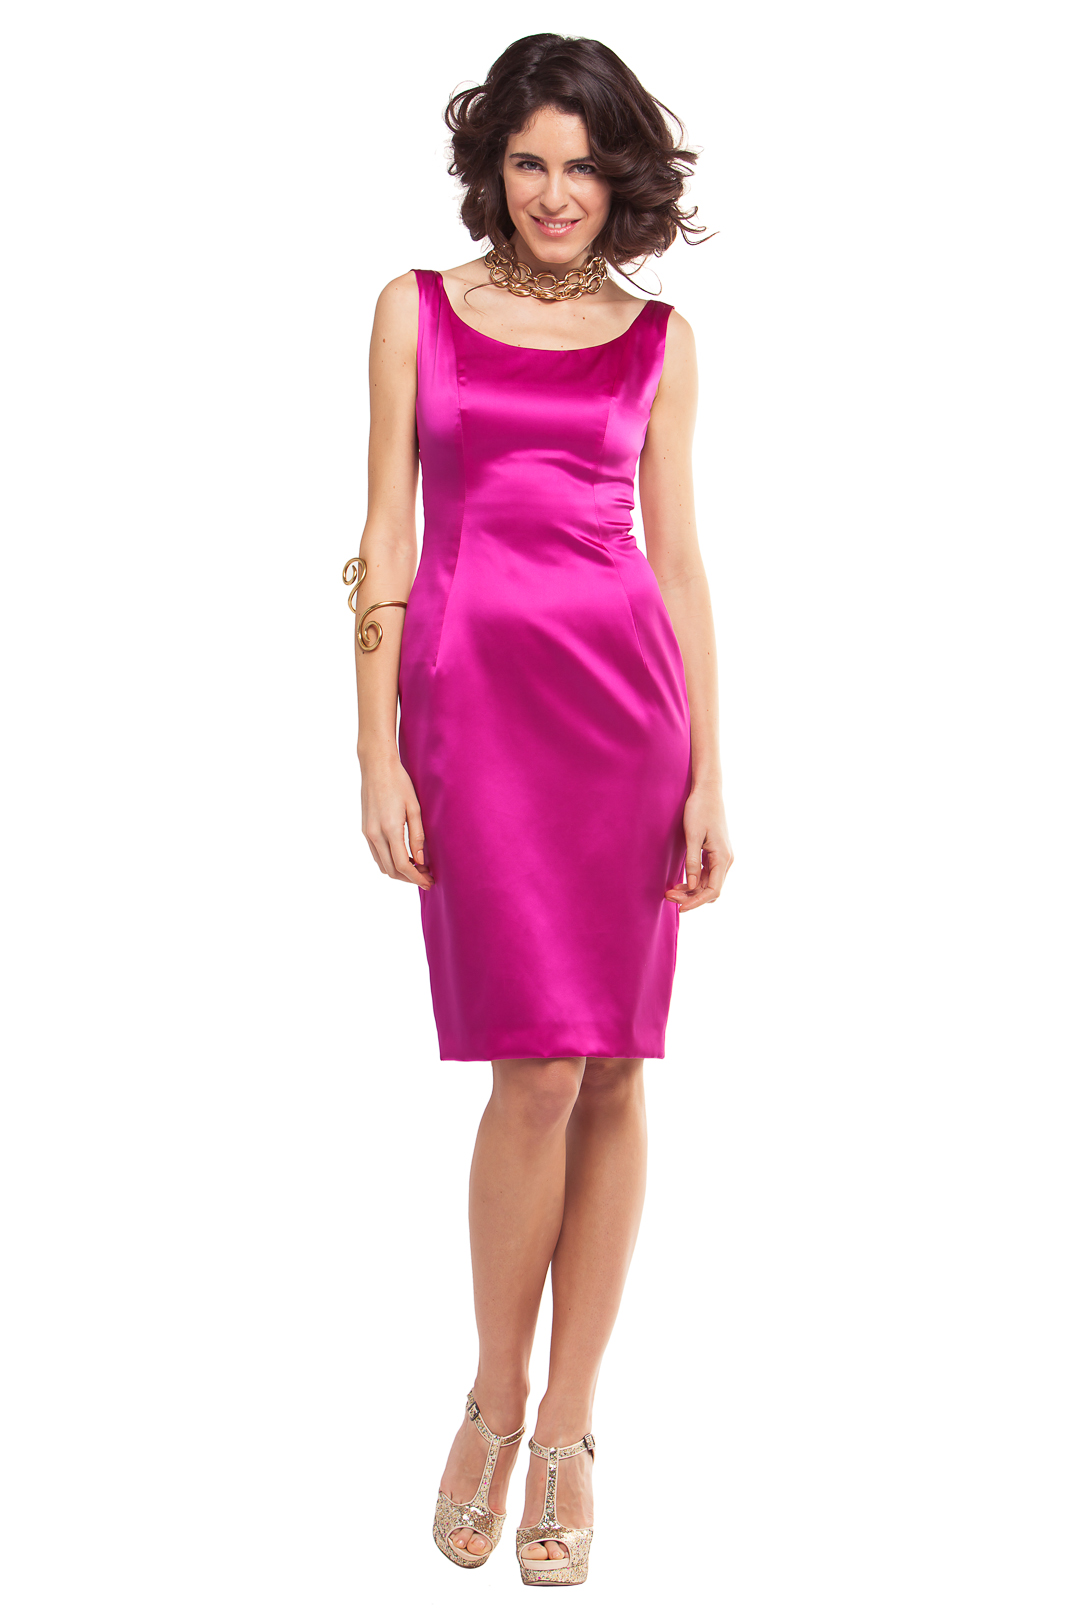 vest-rosa-tirante-zoom-front